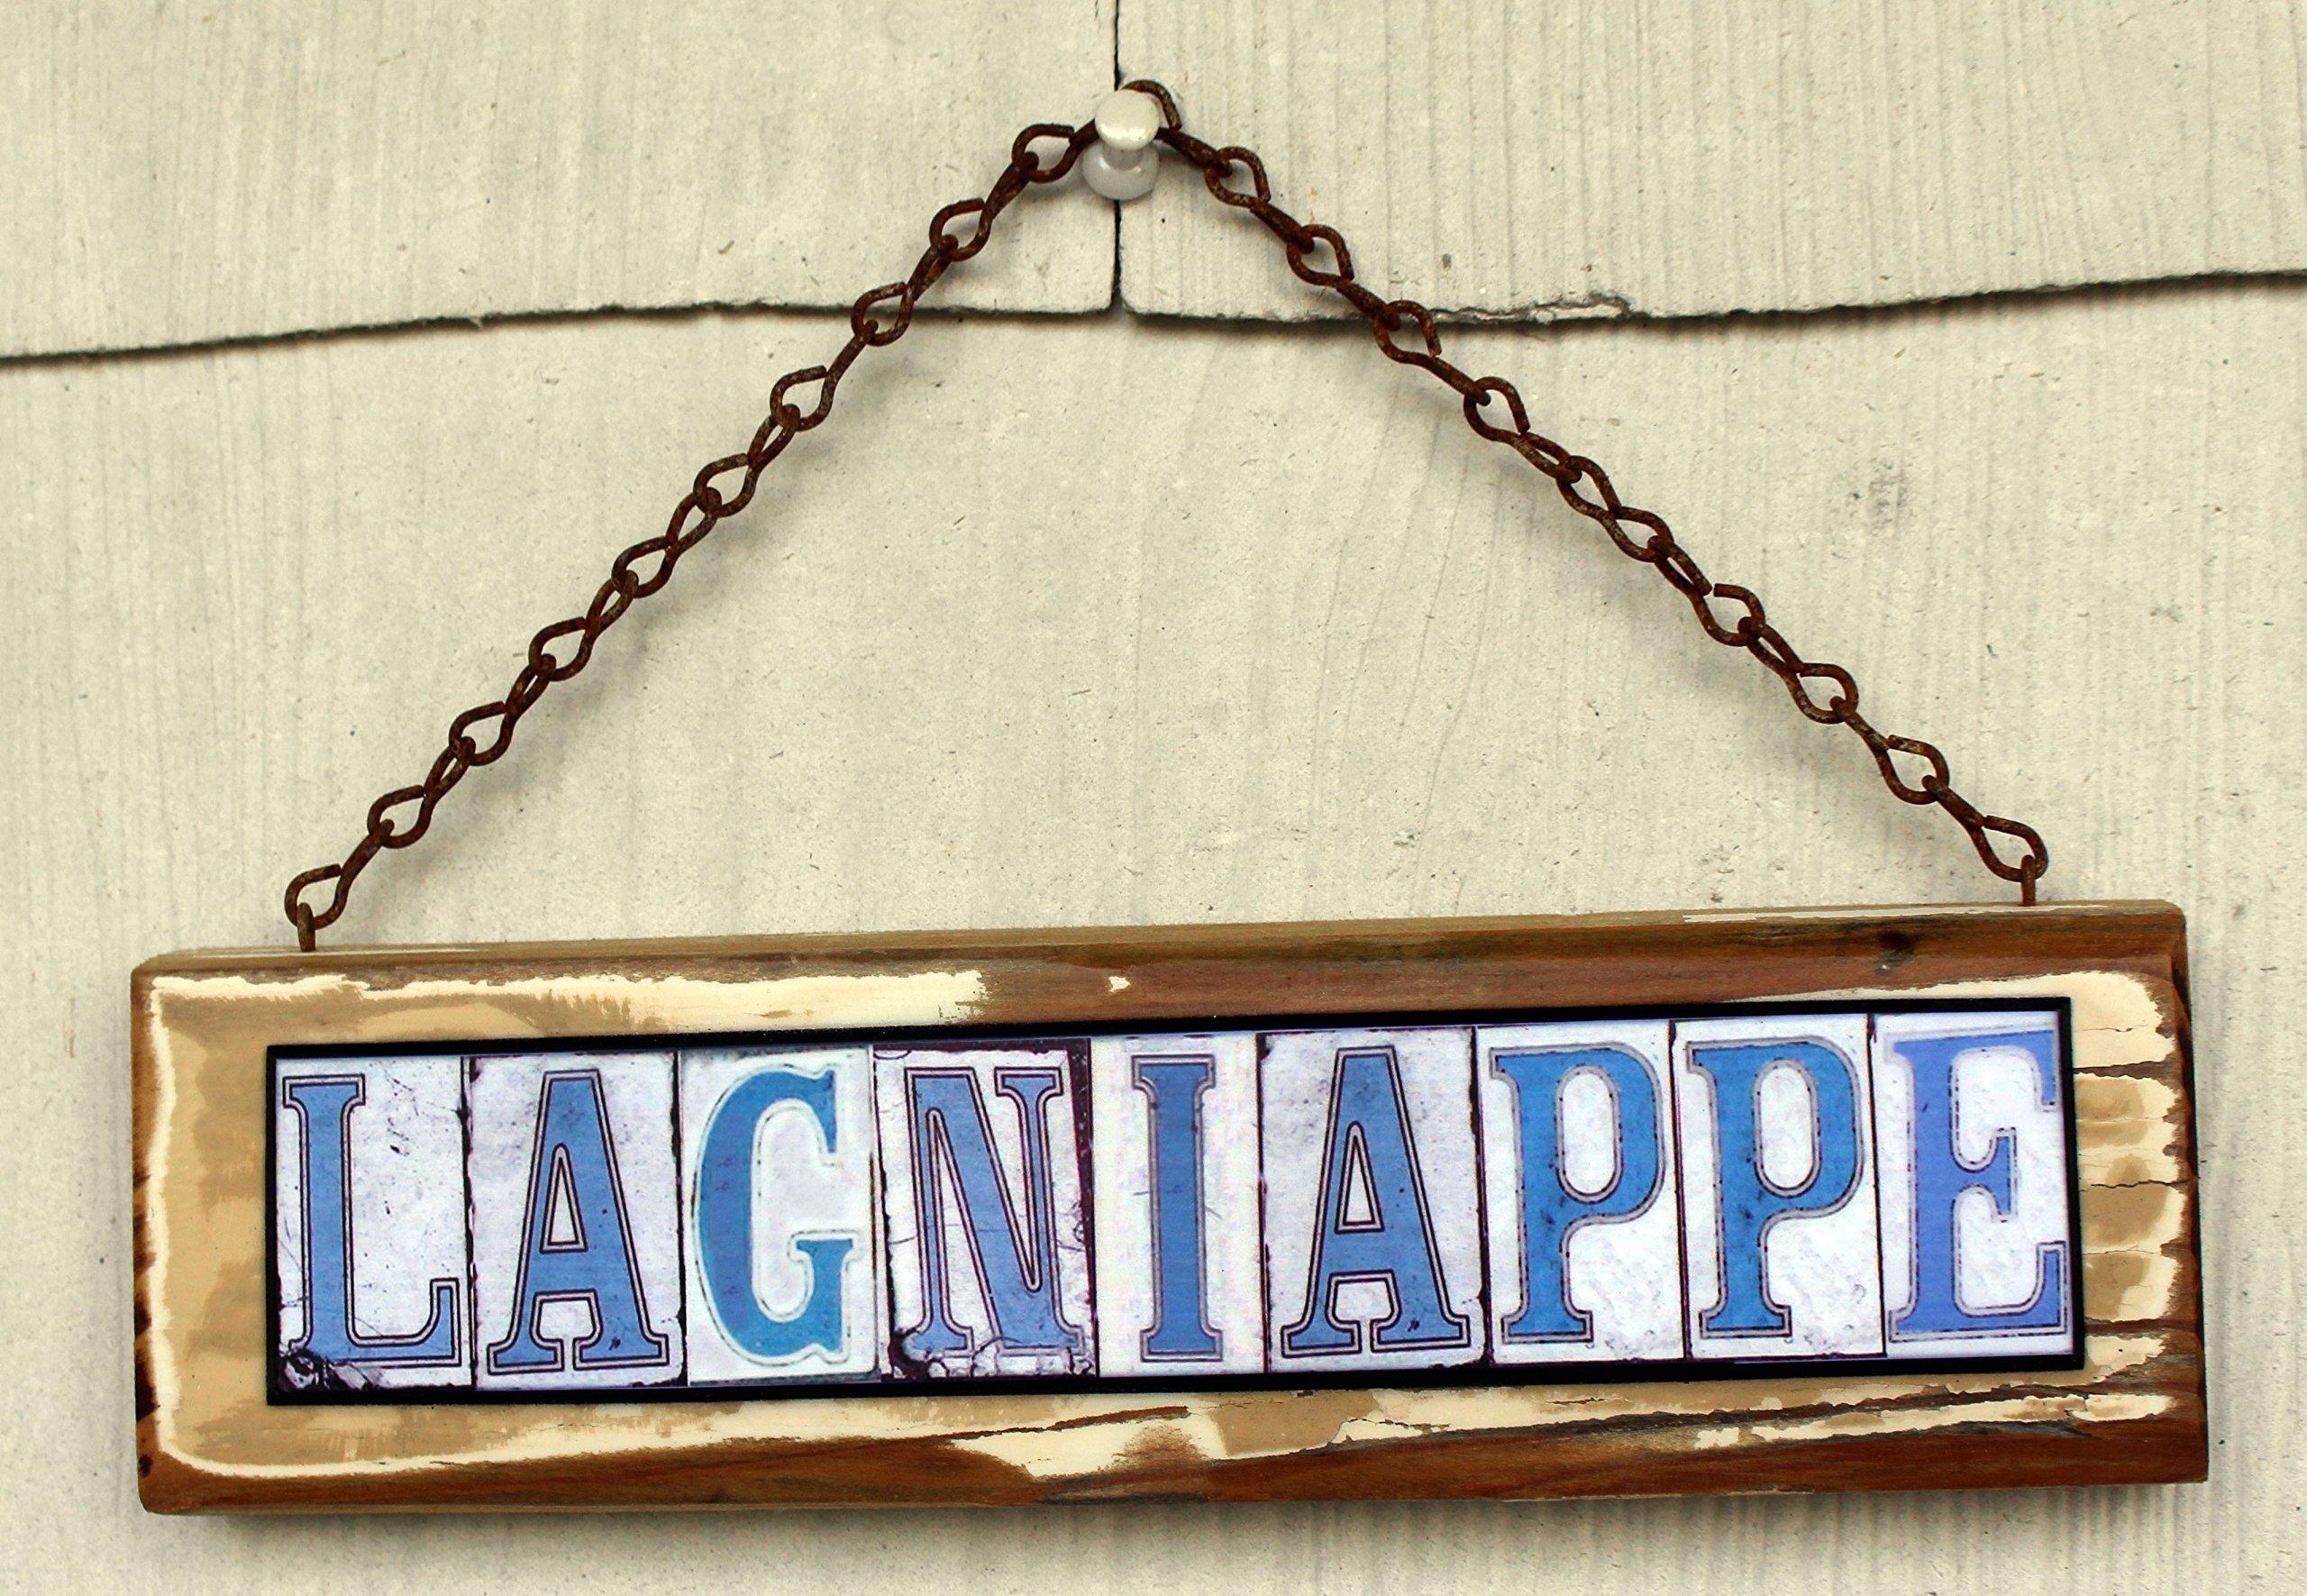 Lagniappe New Orleans Street Tile Sign